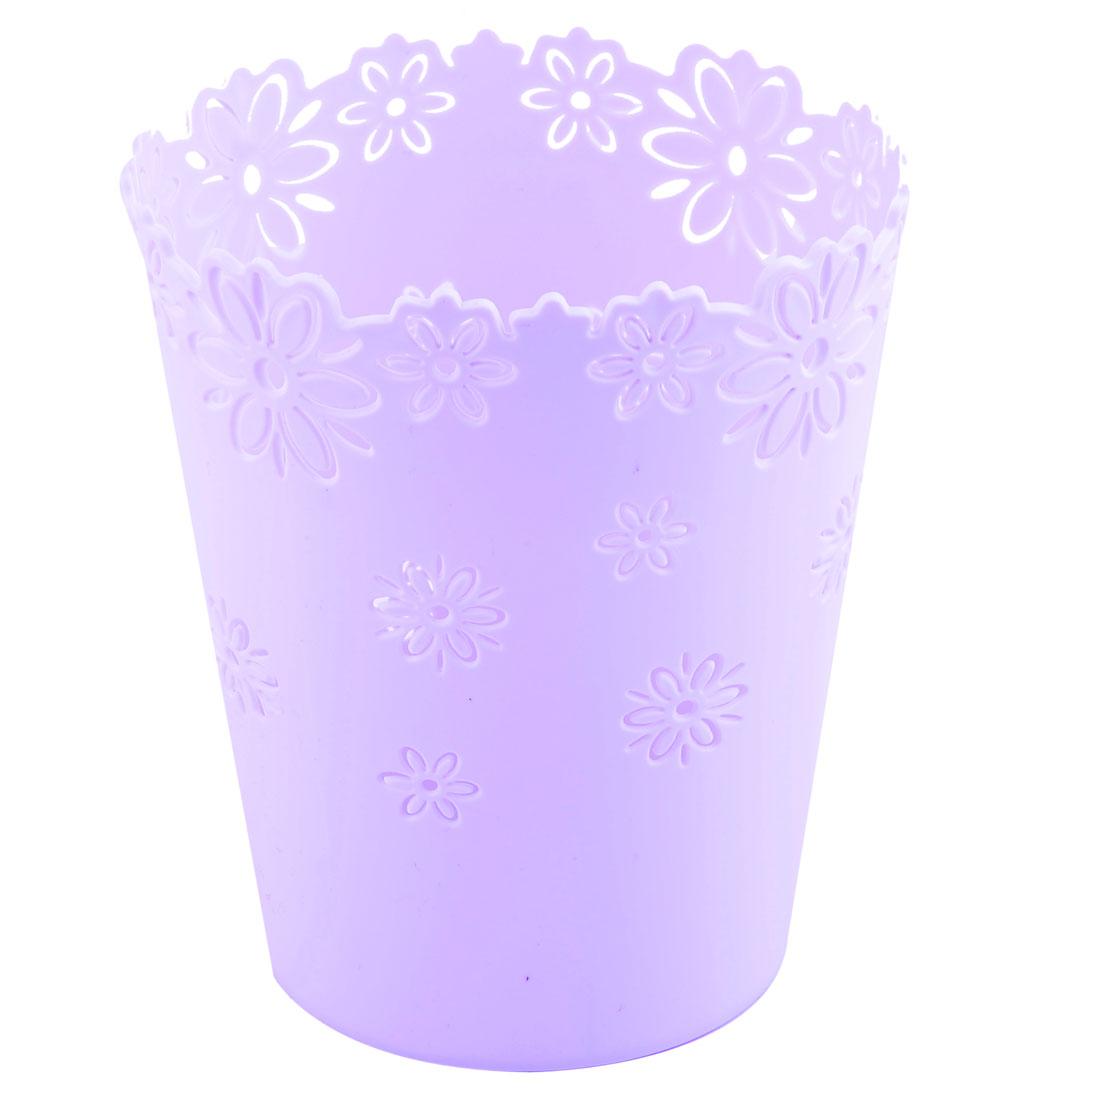 Home Office Desktop Plastic Hollow Out Flower Design Trinket Storage Basket Light Purple